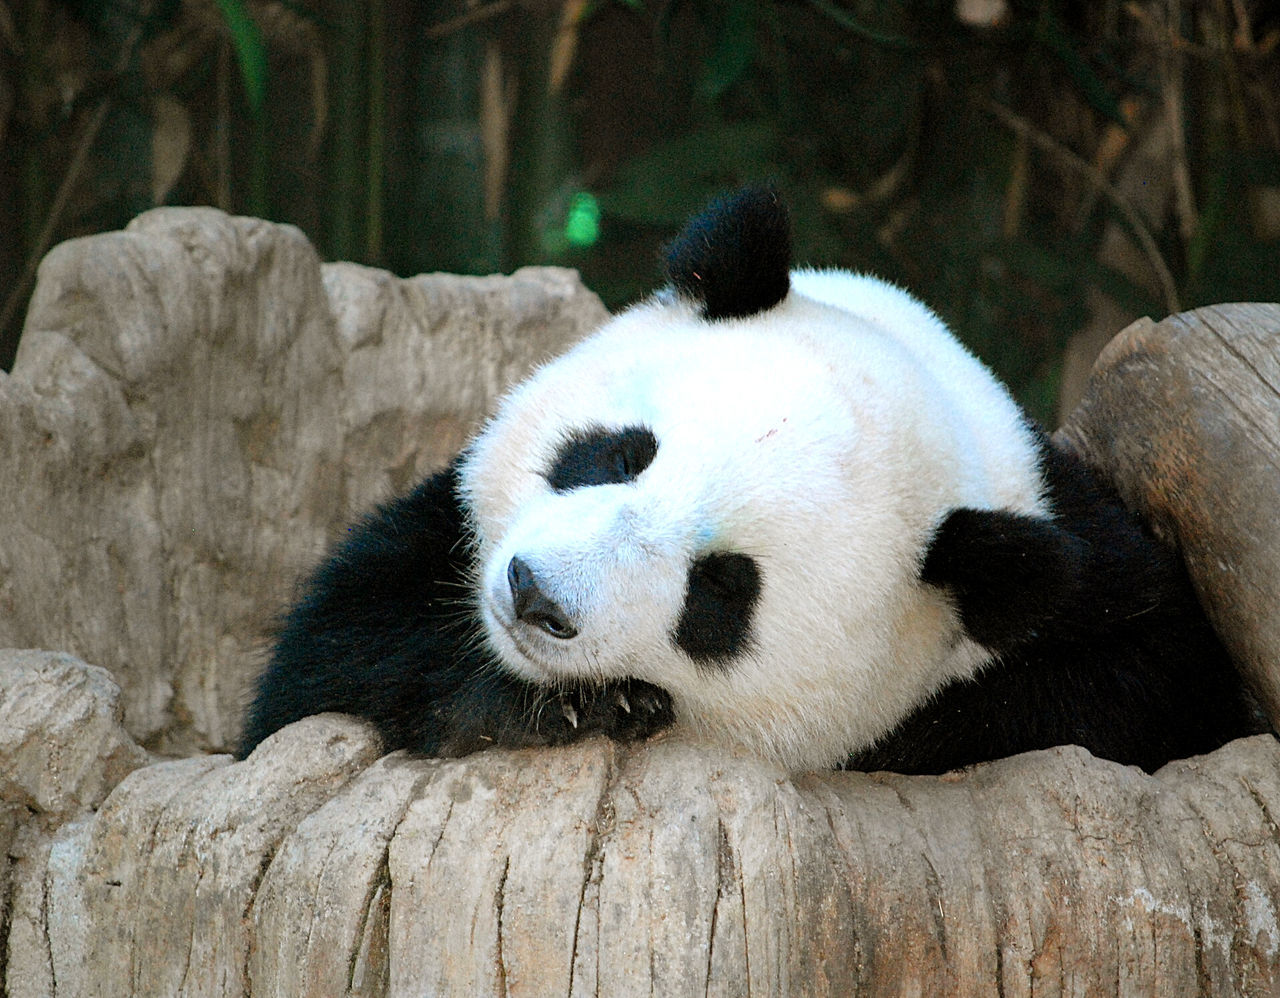 Pandashots Panda Sandiegozoo Cute Photooftheday